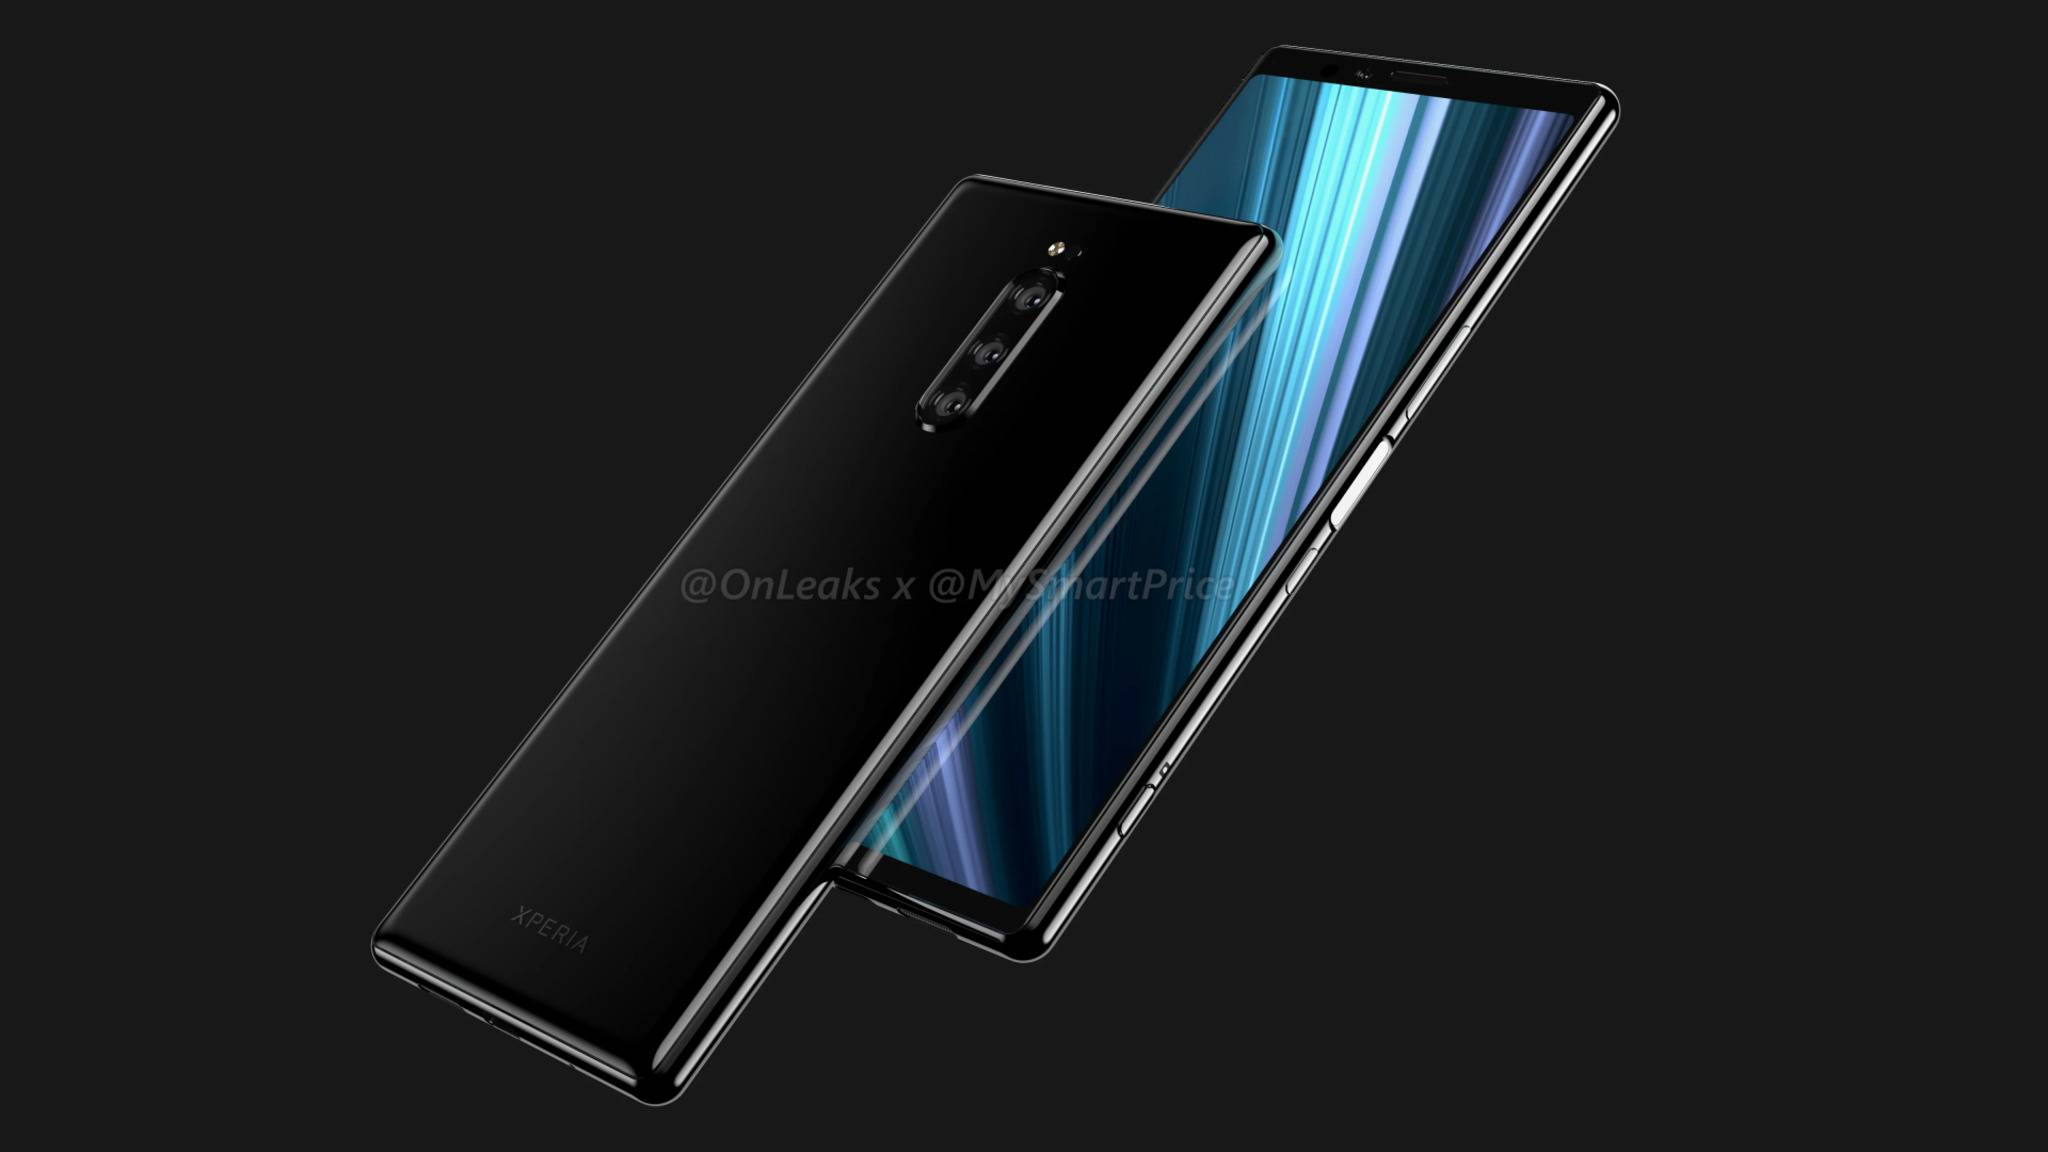 Das Sony Xperia XZ4 soll High-End-Technik an Bord haben.